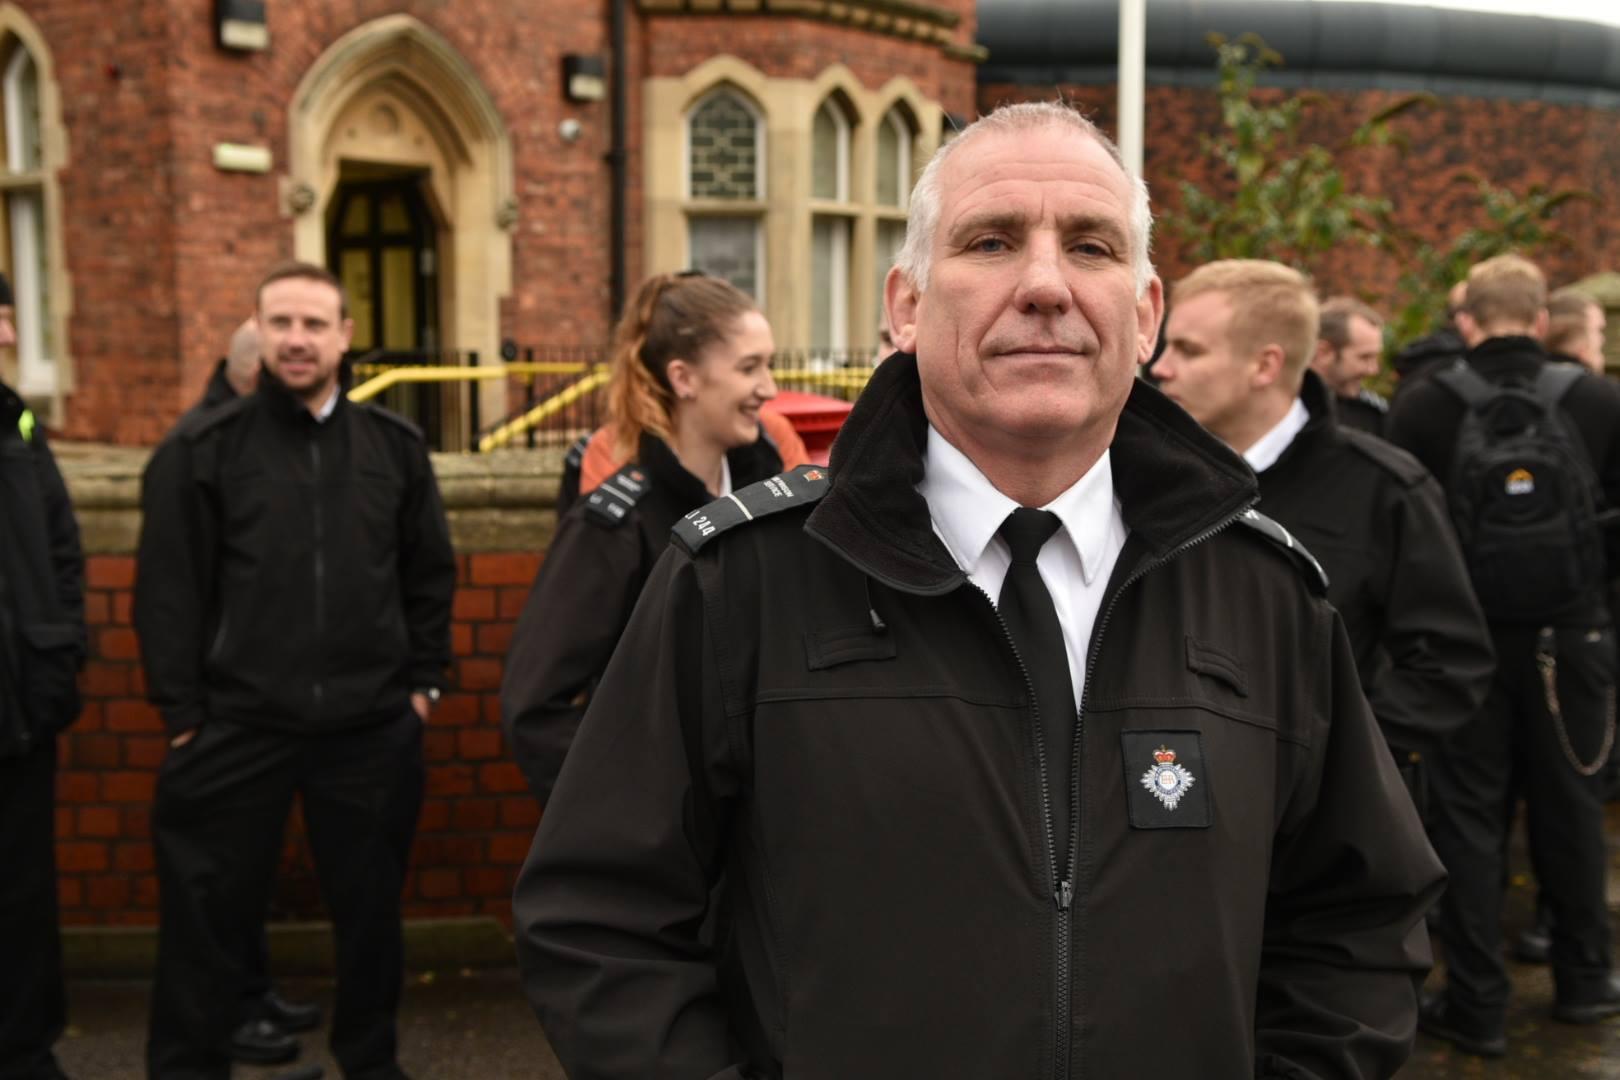 Frontline prison officer and regional POA spokesperson Paul Wray. Photo: Steve Smailes for The Lincolnite